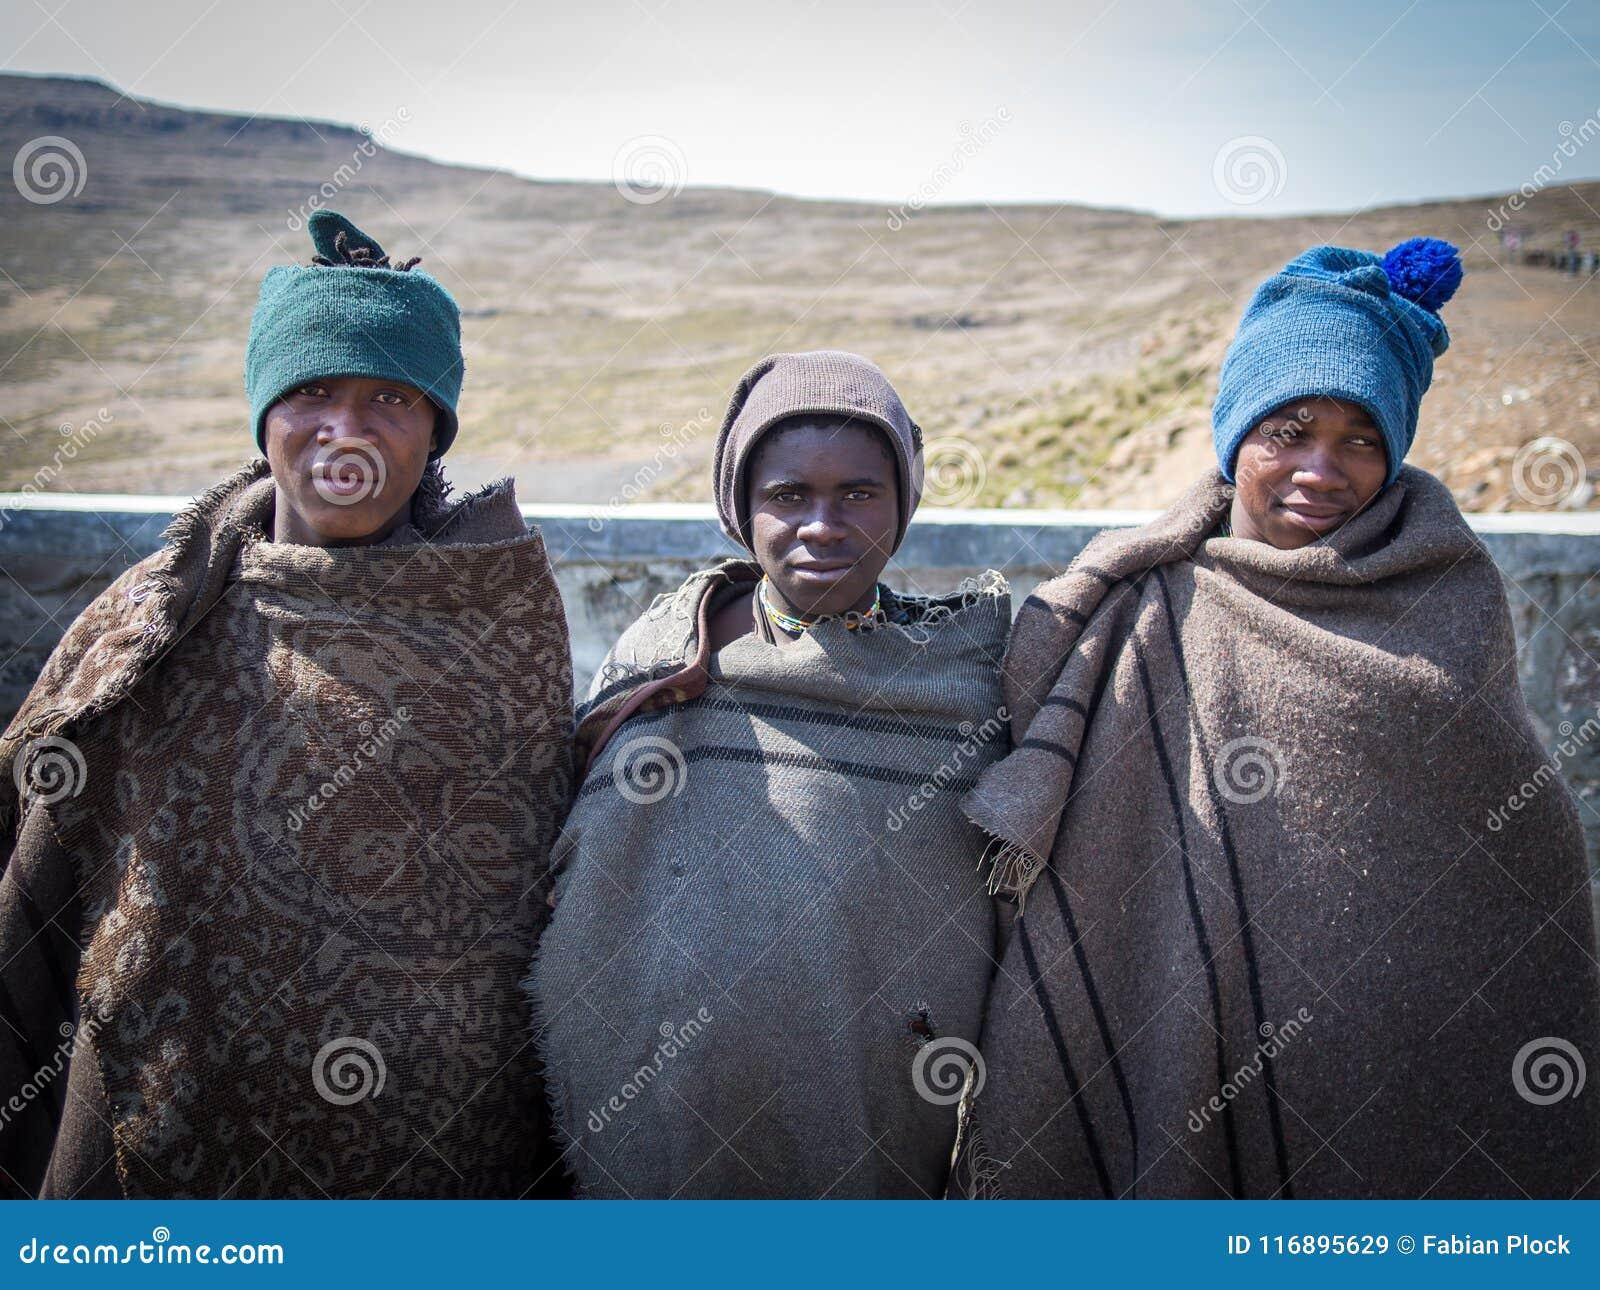 Mokhotlong, Lesotho - September 11, 2016: Drie niet geïdentificeerde jonge Afrikaanse sheperds in traditionele dikke dekens